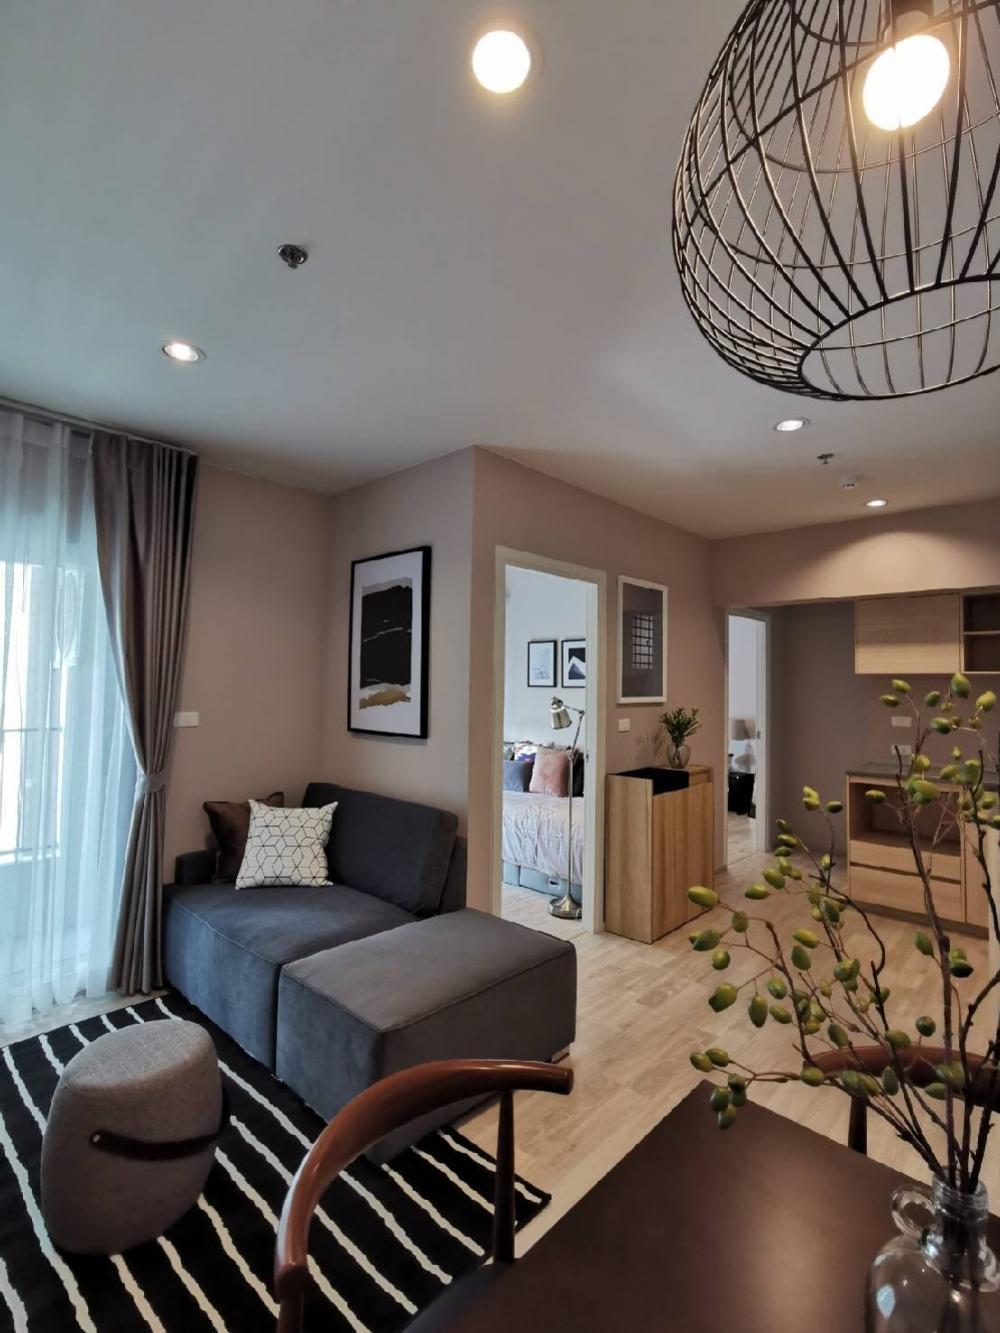 Room avaiable JUNE2020 For Rent*****Fully Furnished( Owner Post )ให้เช่า พลัม รามคำแหงห้องใหญ่ ราคาดีRare Item 1 BedPlus 39 ตรม  ***** วิวสระ ชั้น 15 ตำแหน่ง 28